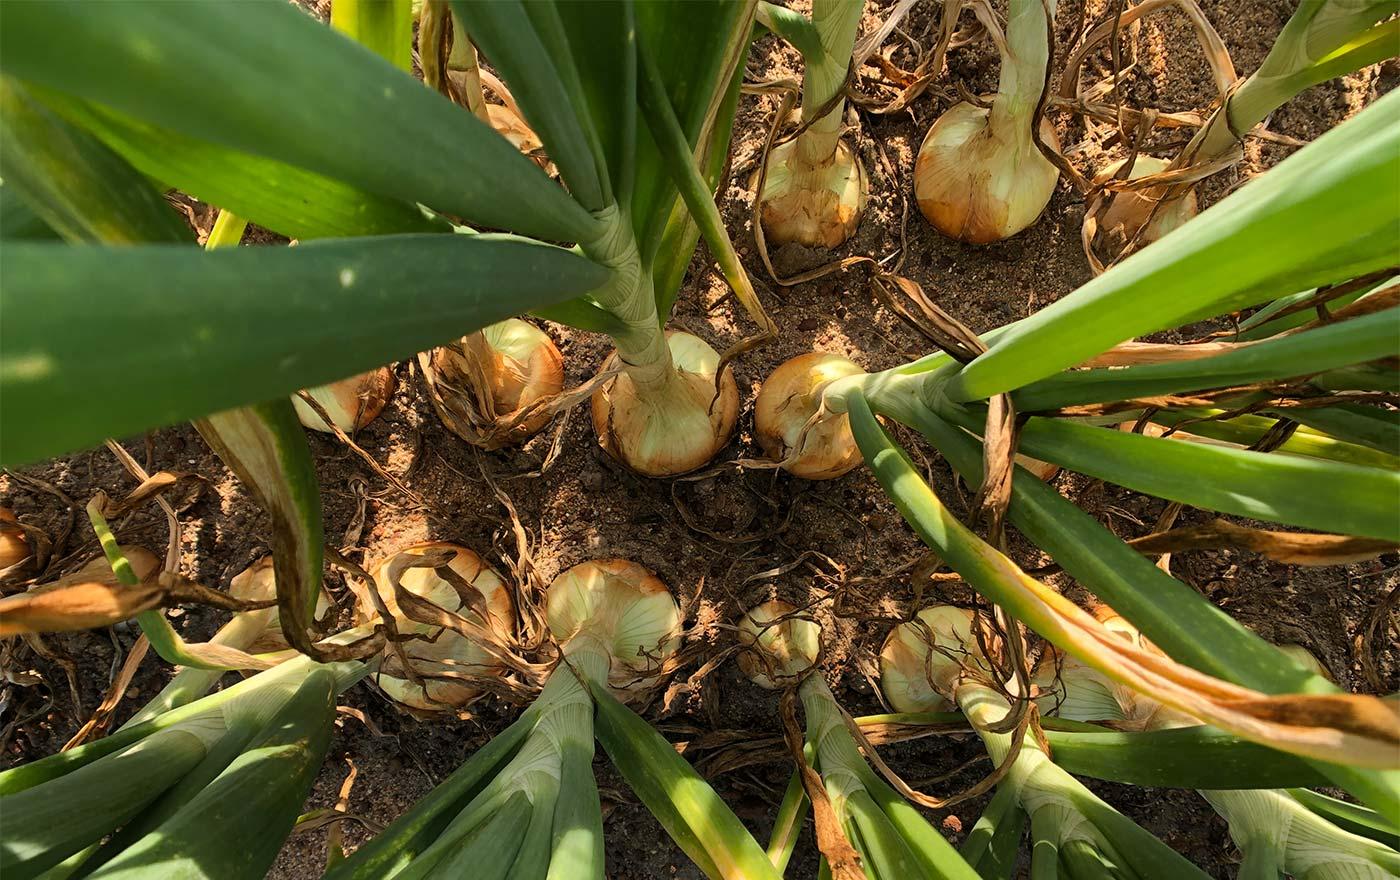 Vidalia Onions birds eye view